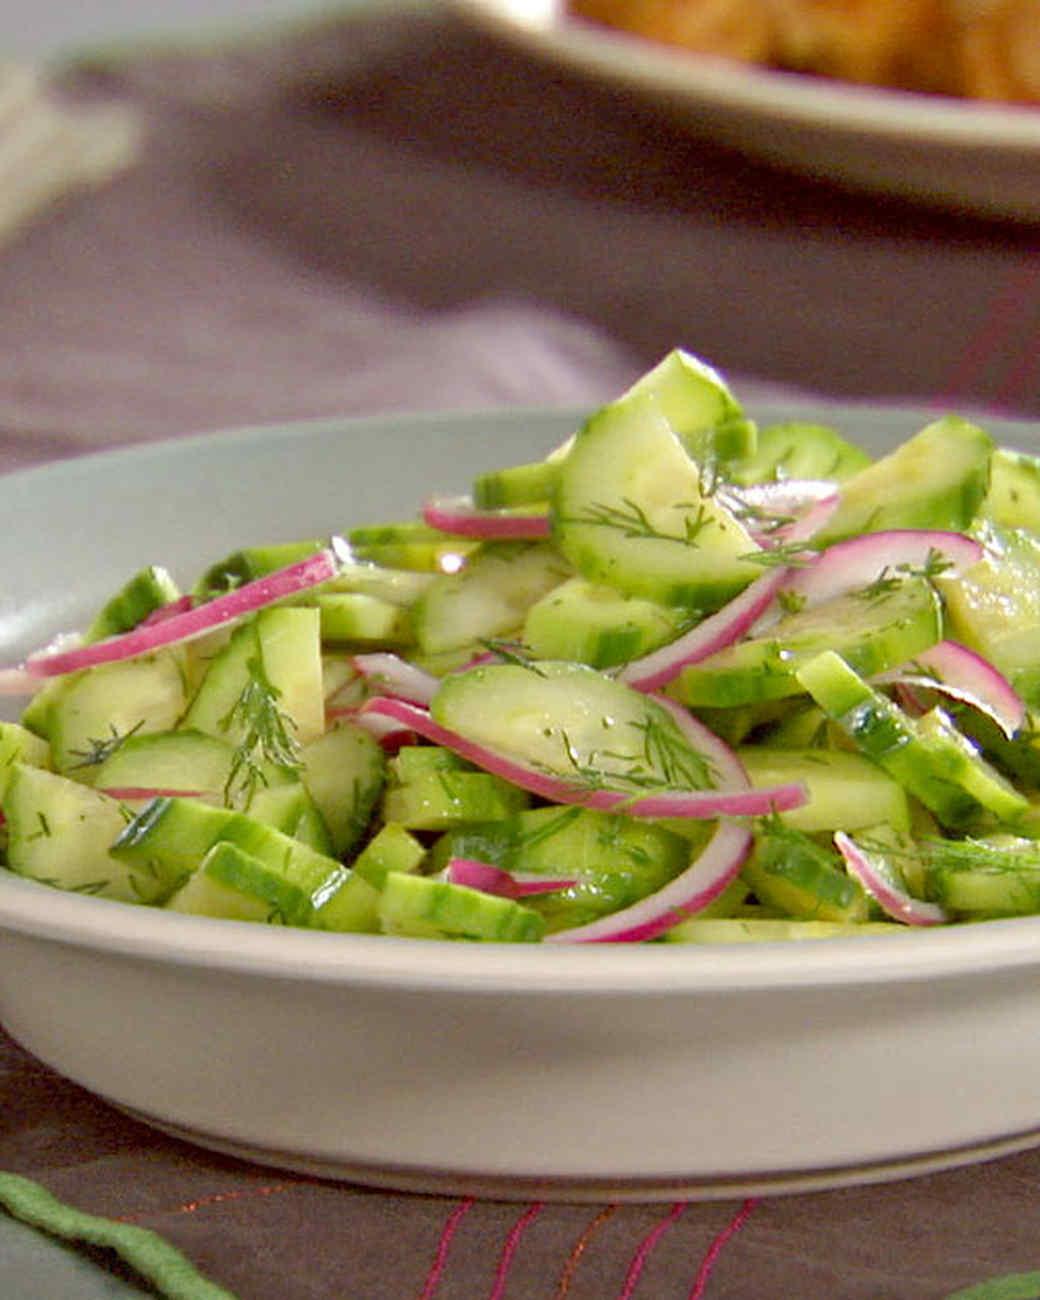 mh_1088_cucumber_salad.jpg